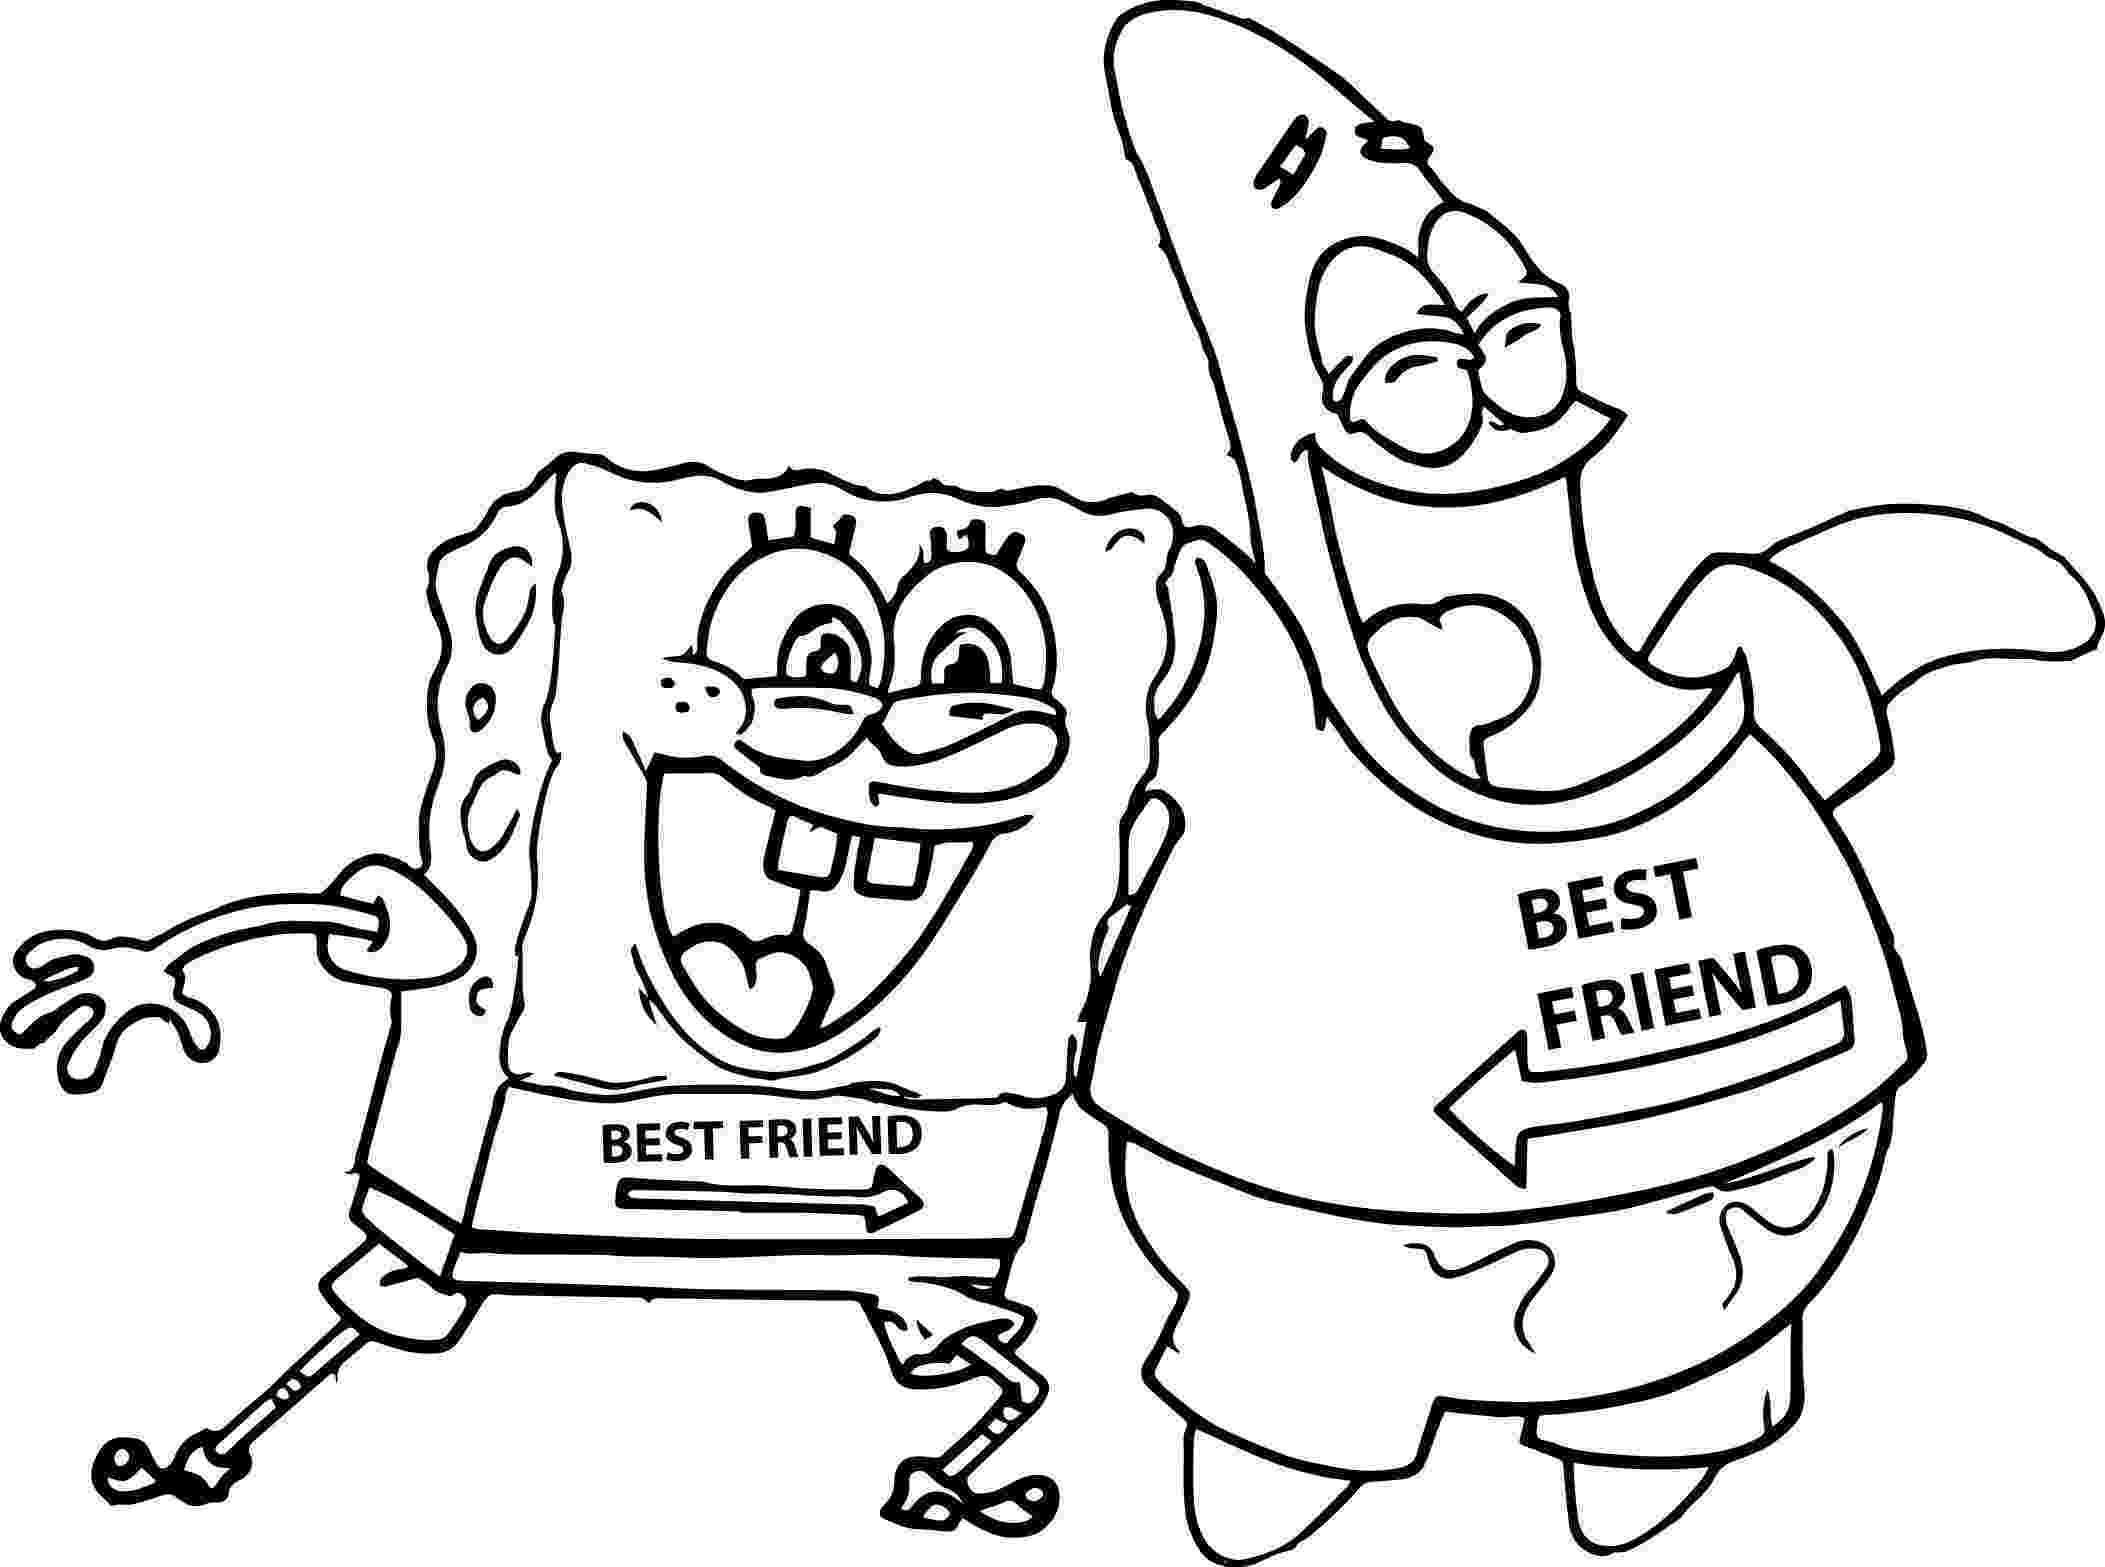 sponge bob coloring page printable spongebob coloring pages for kids cool2bkids bob page coloring sponge